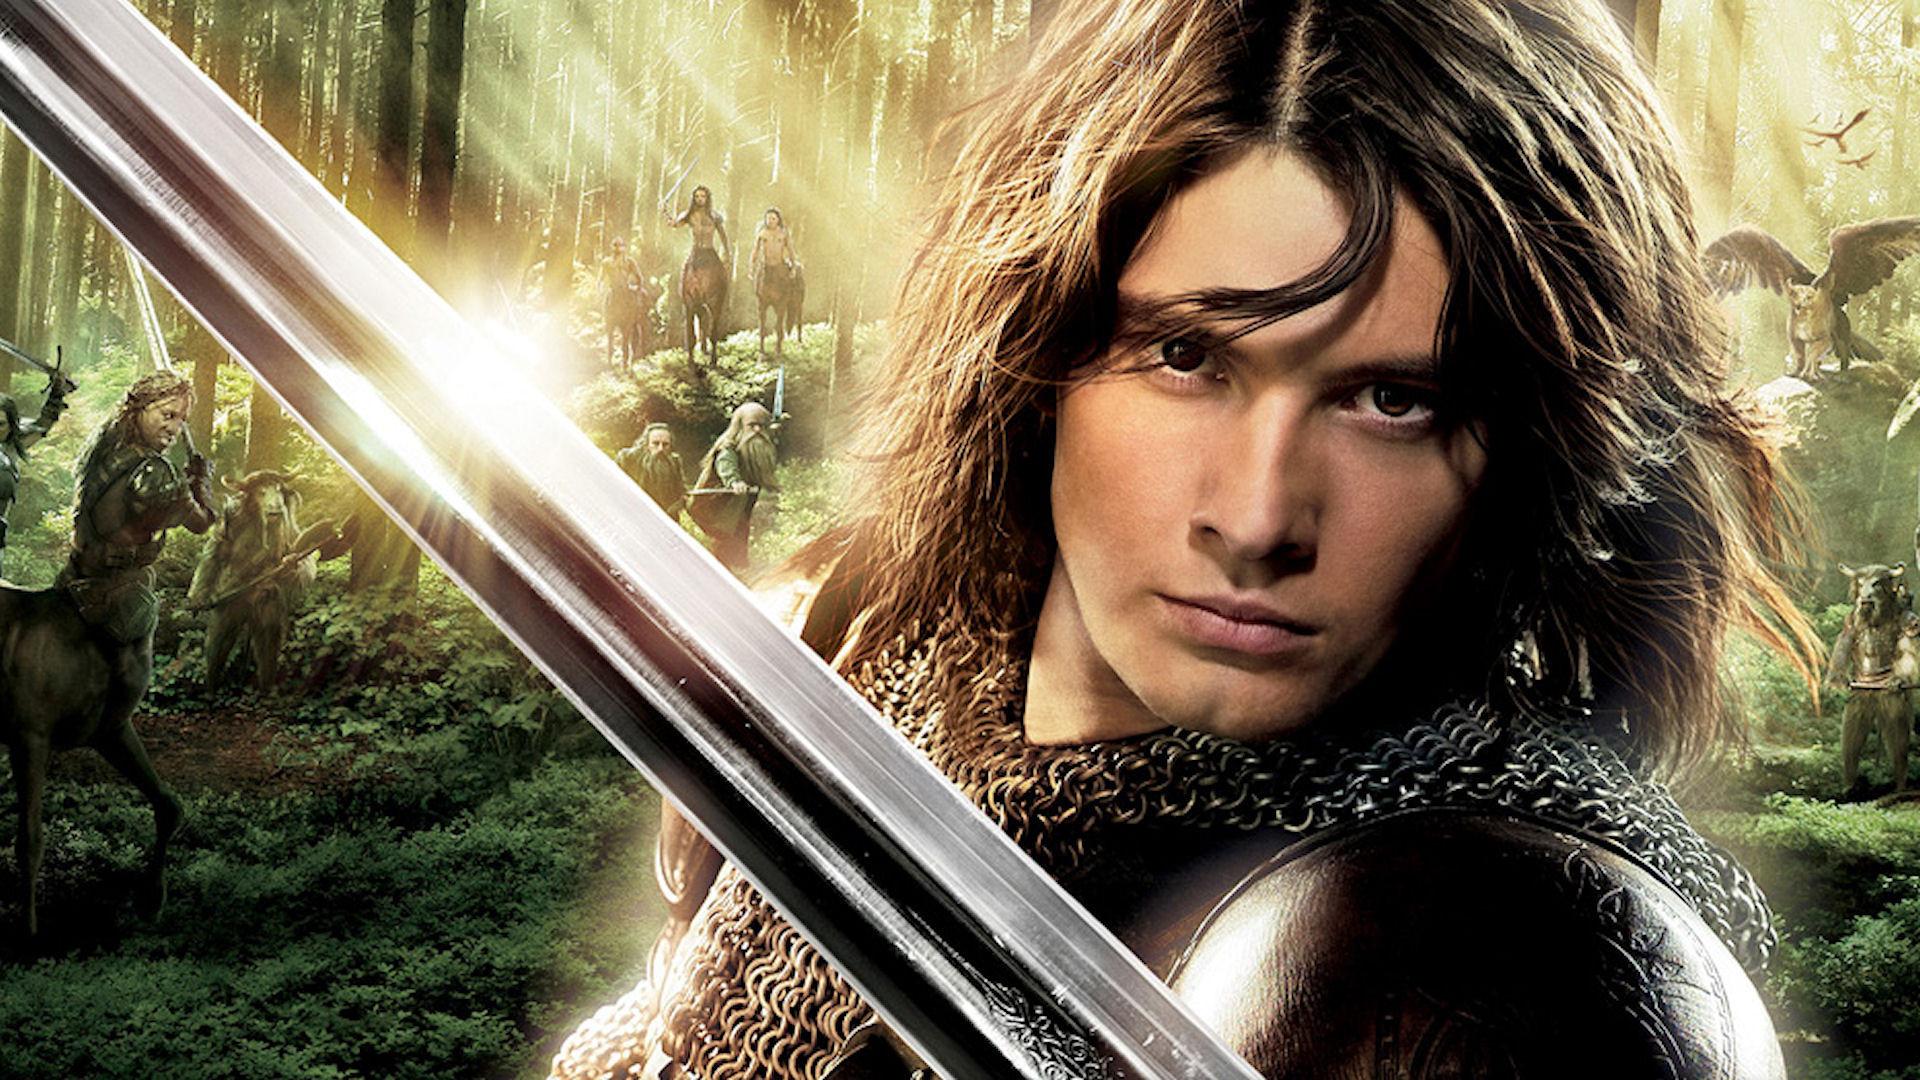 Watch Prince Caspian